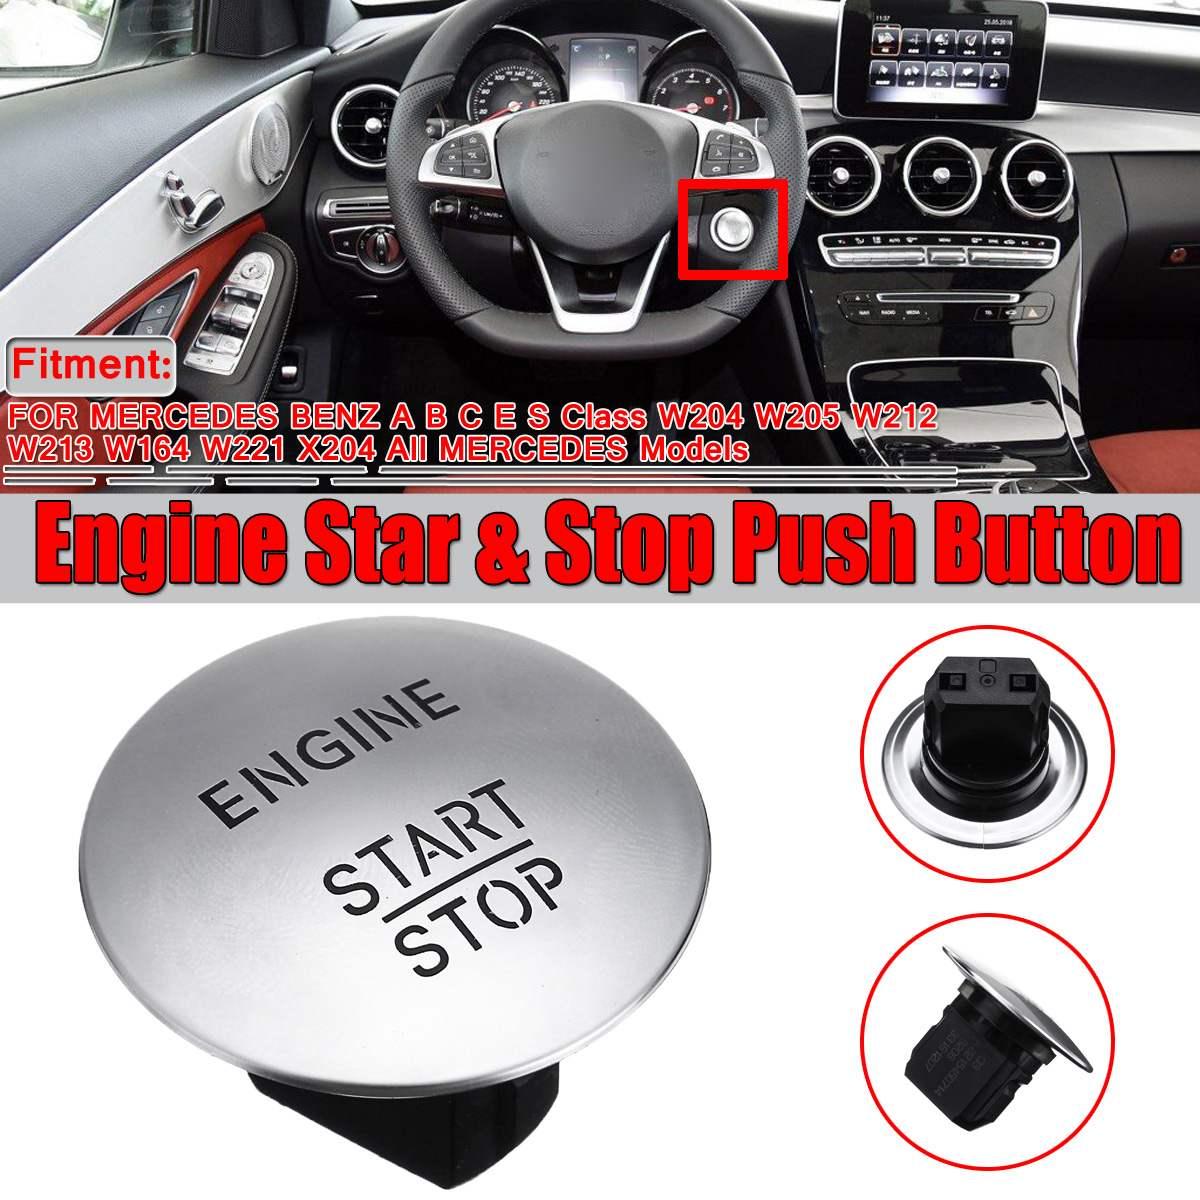 NEW Fits on ALL Models Porsche LED Push Start Button Engine Ignition Starter